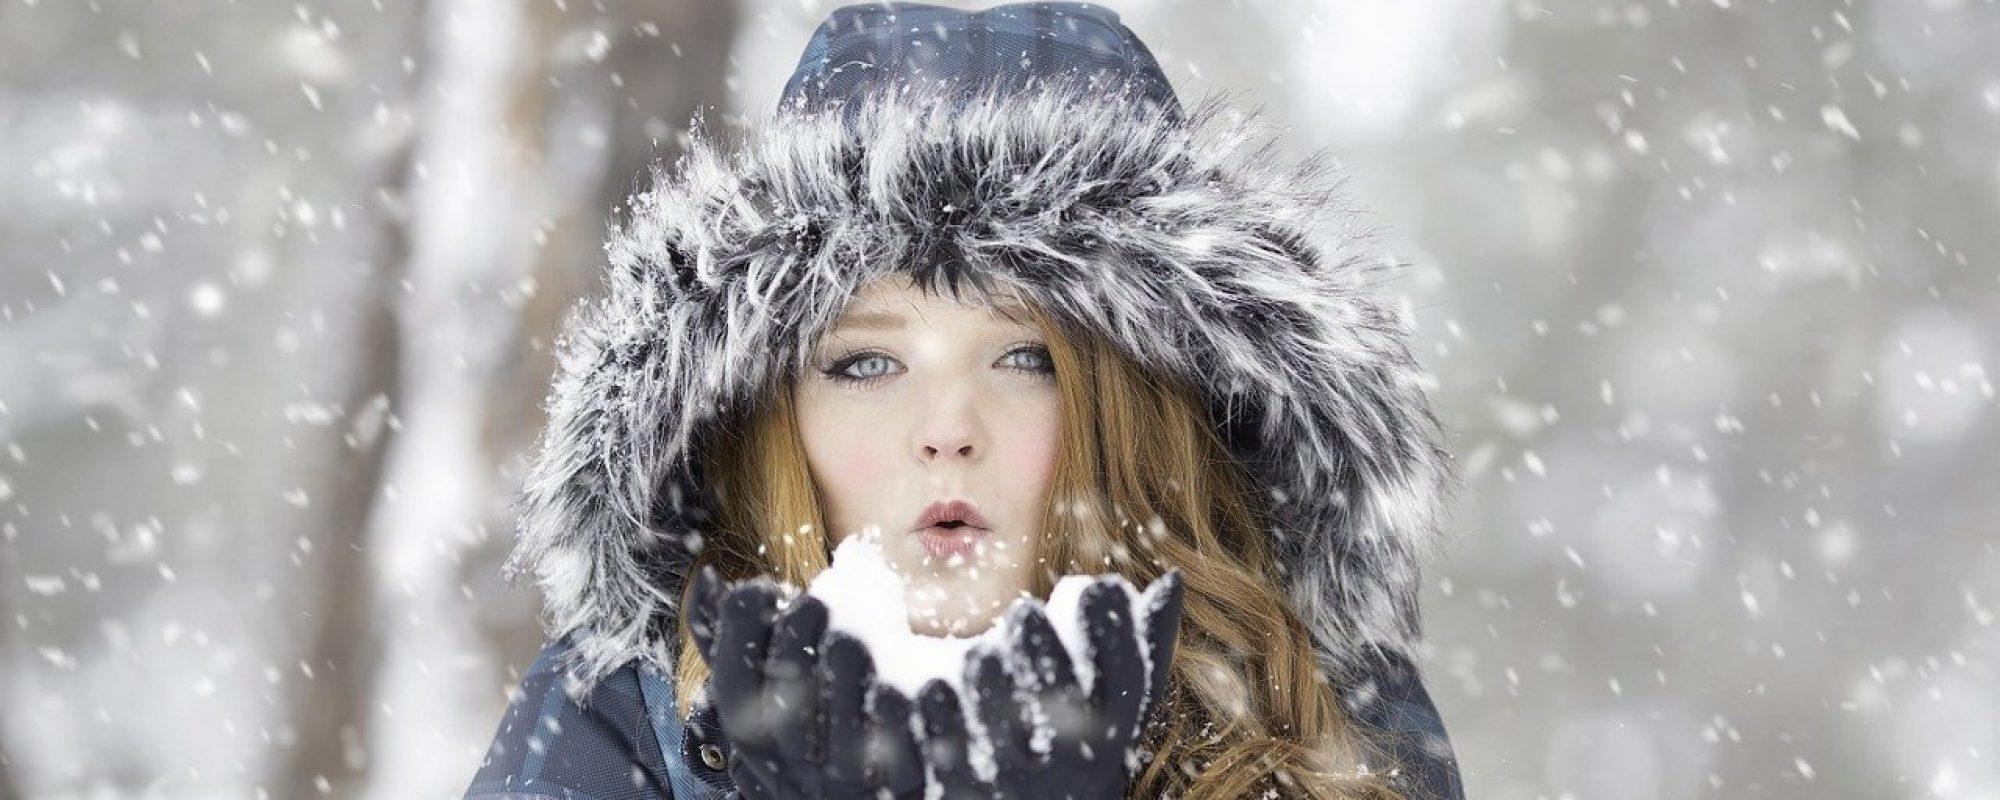 woman, snow, blow